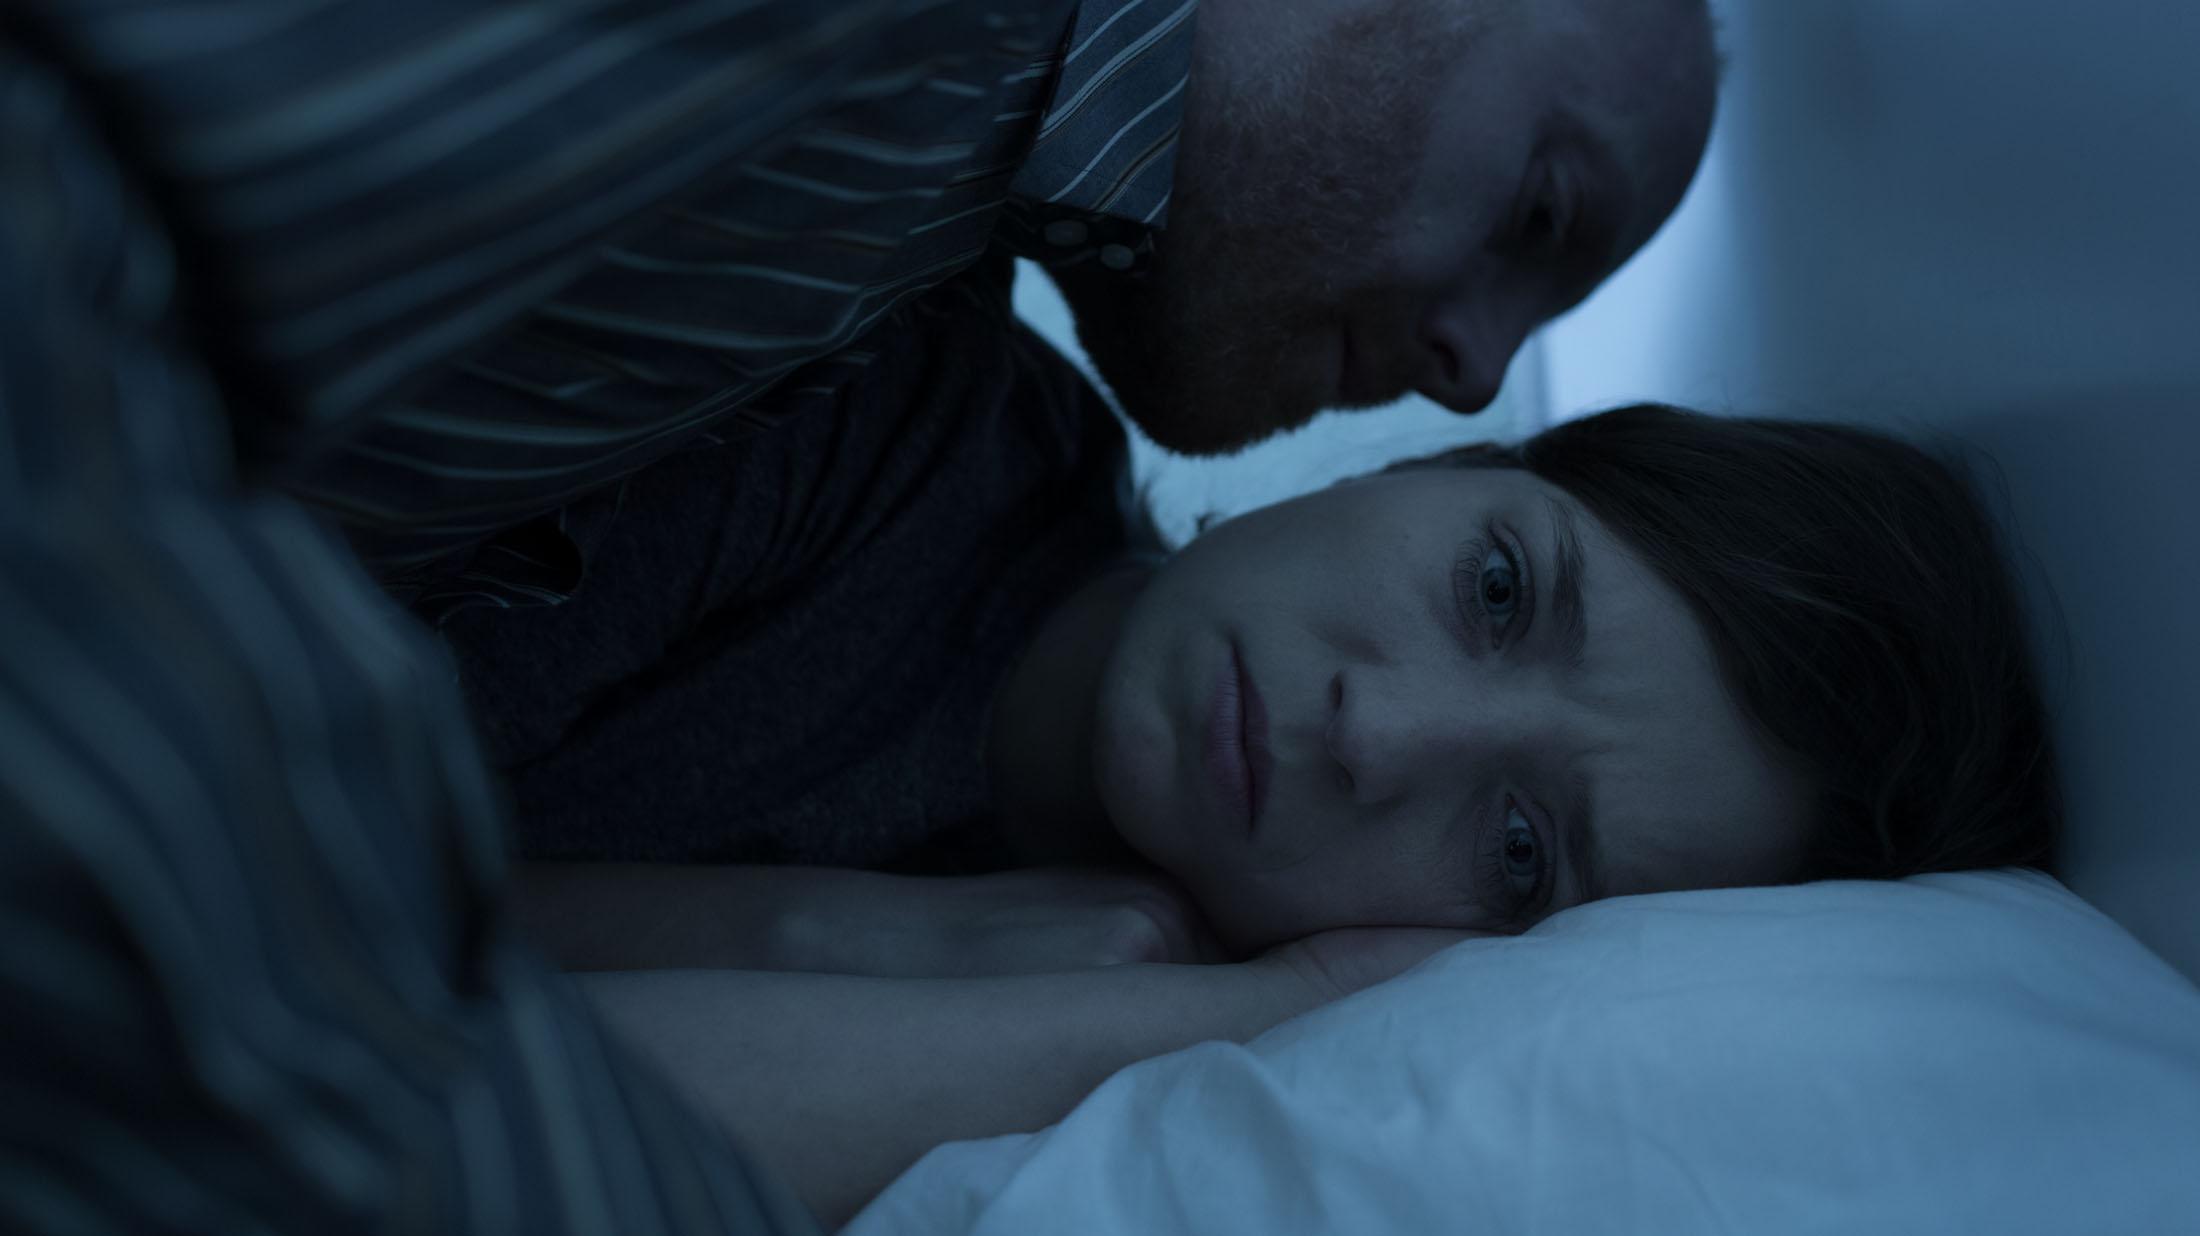 THERAPIE directed by Tobias Brants (NARAFI 2017) - DoP Killian De Sitter